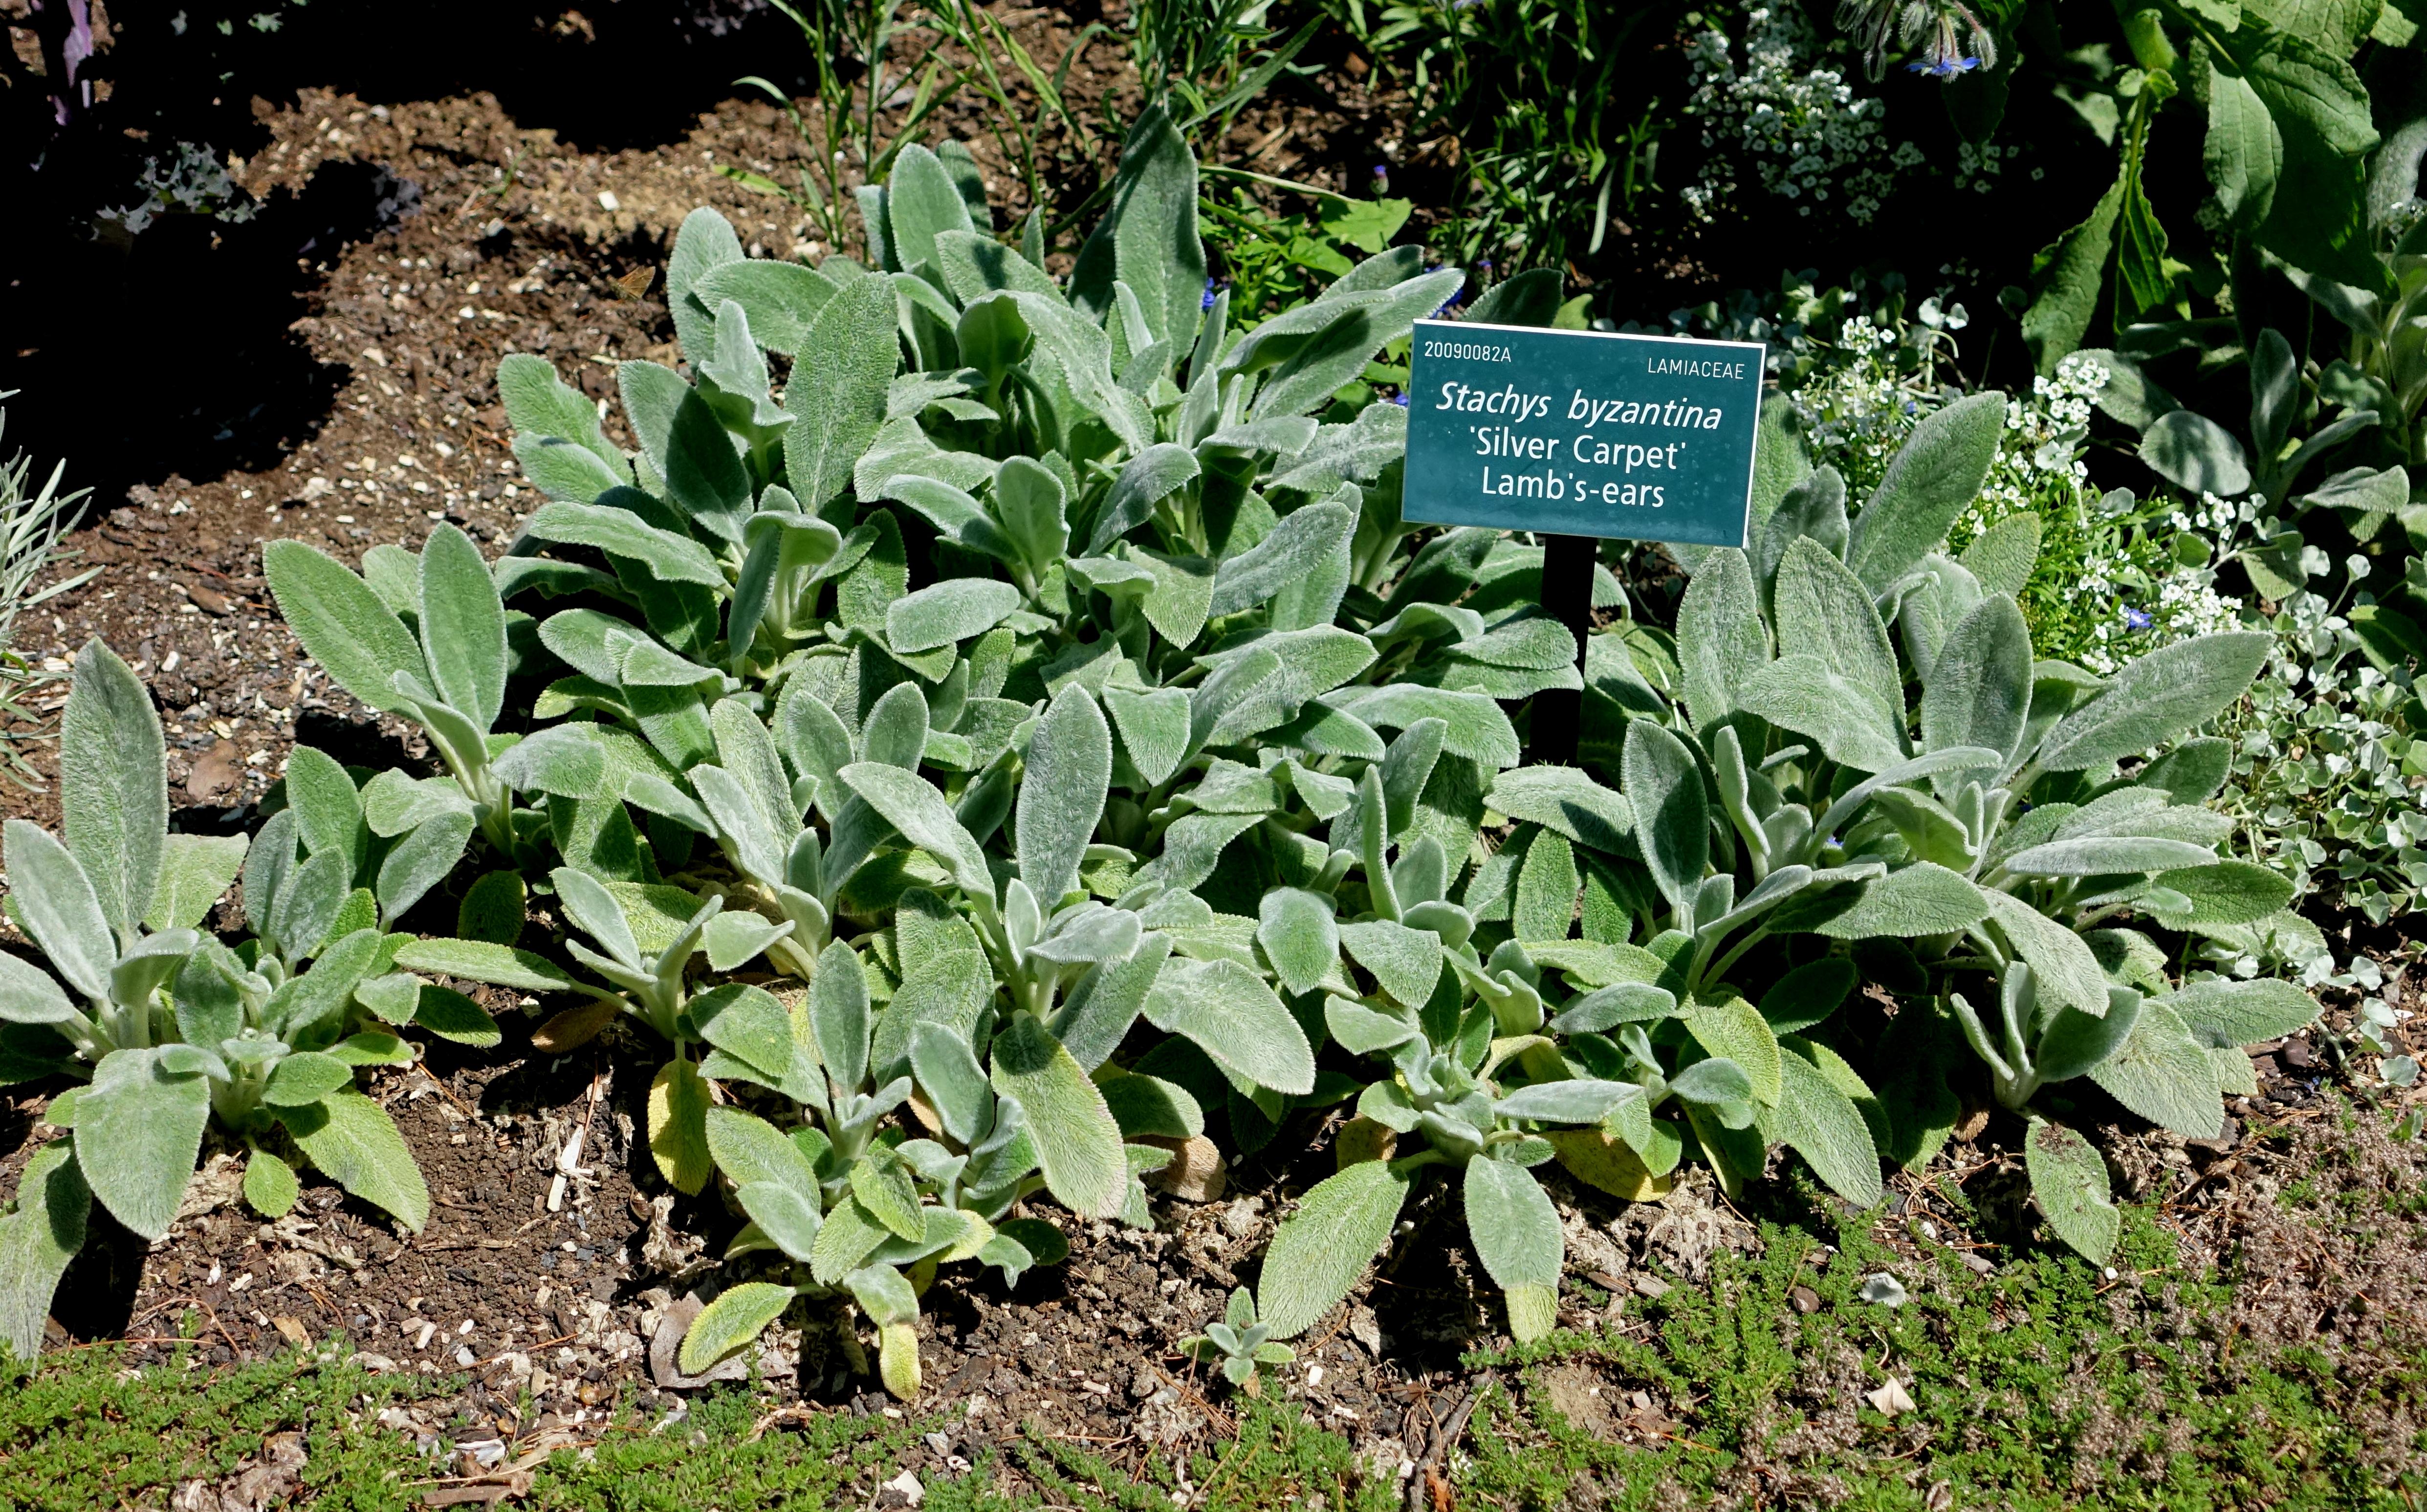 File:Stachys byzantina 'Silver Carpet' - Coastal Maine Botanical Gardens - DSC03104.jpg